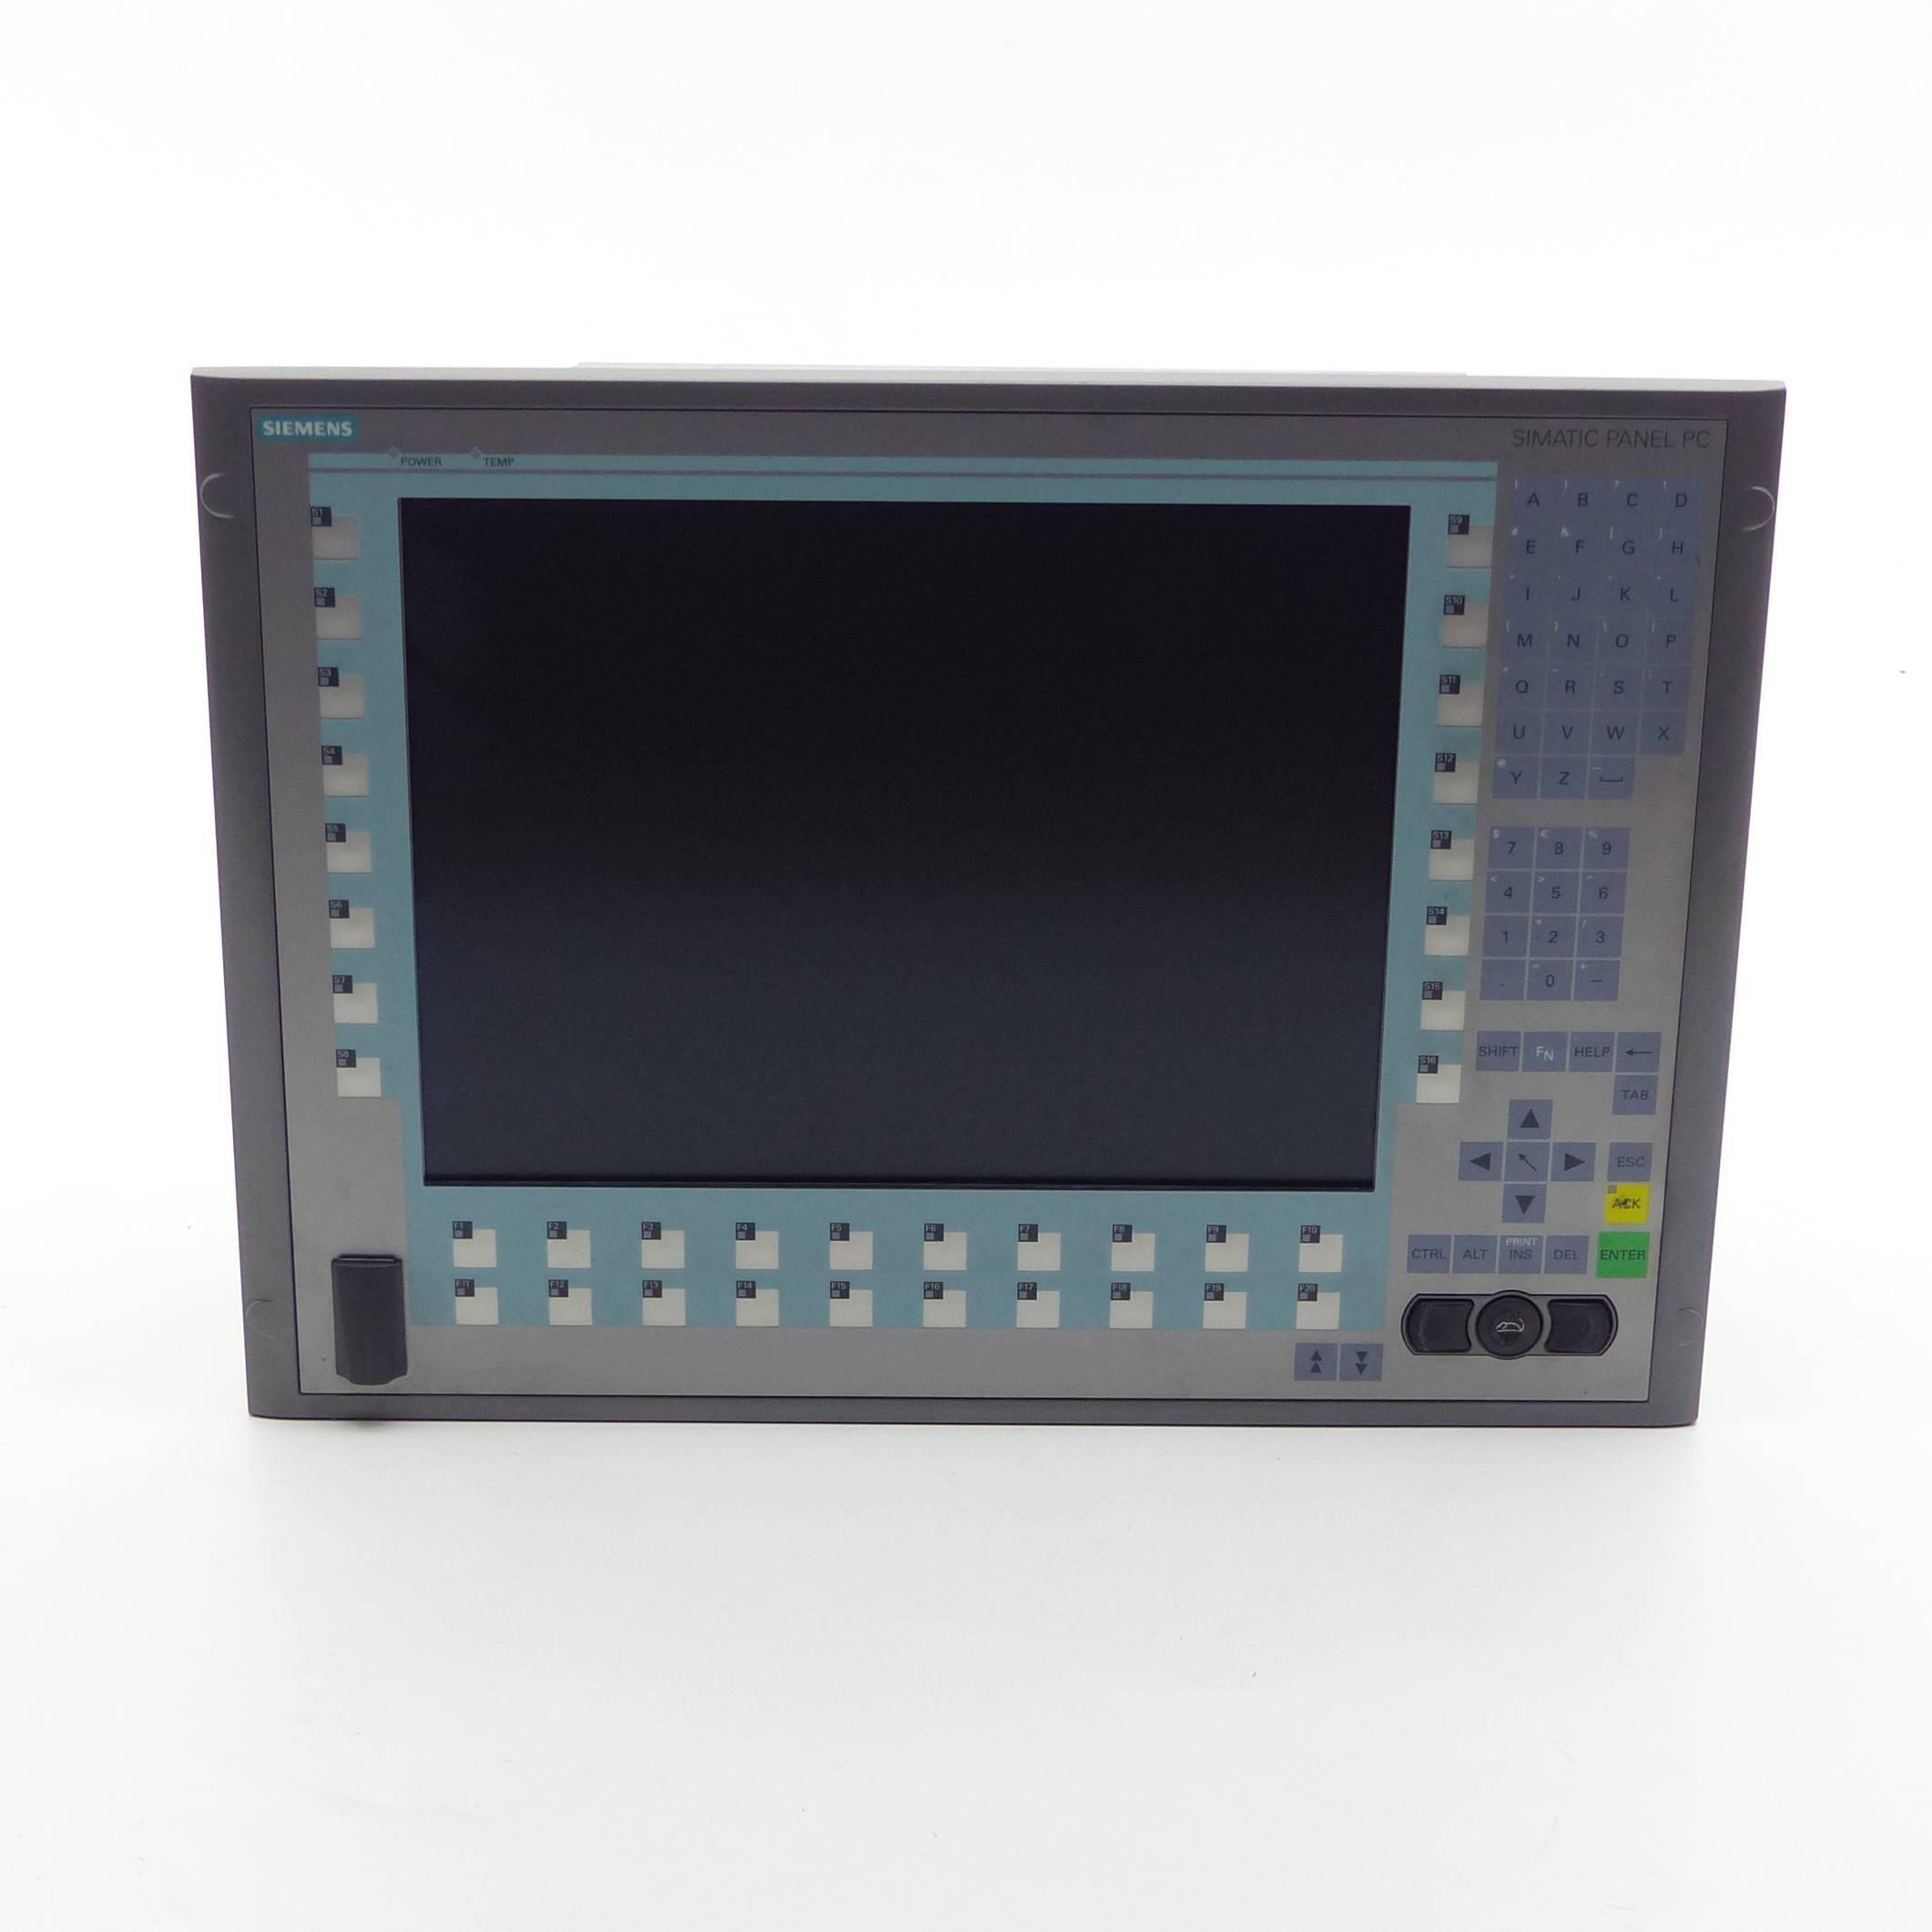 6AV7803-0AA10-1AC0